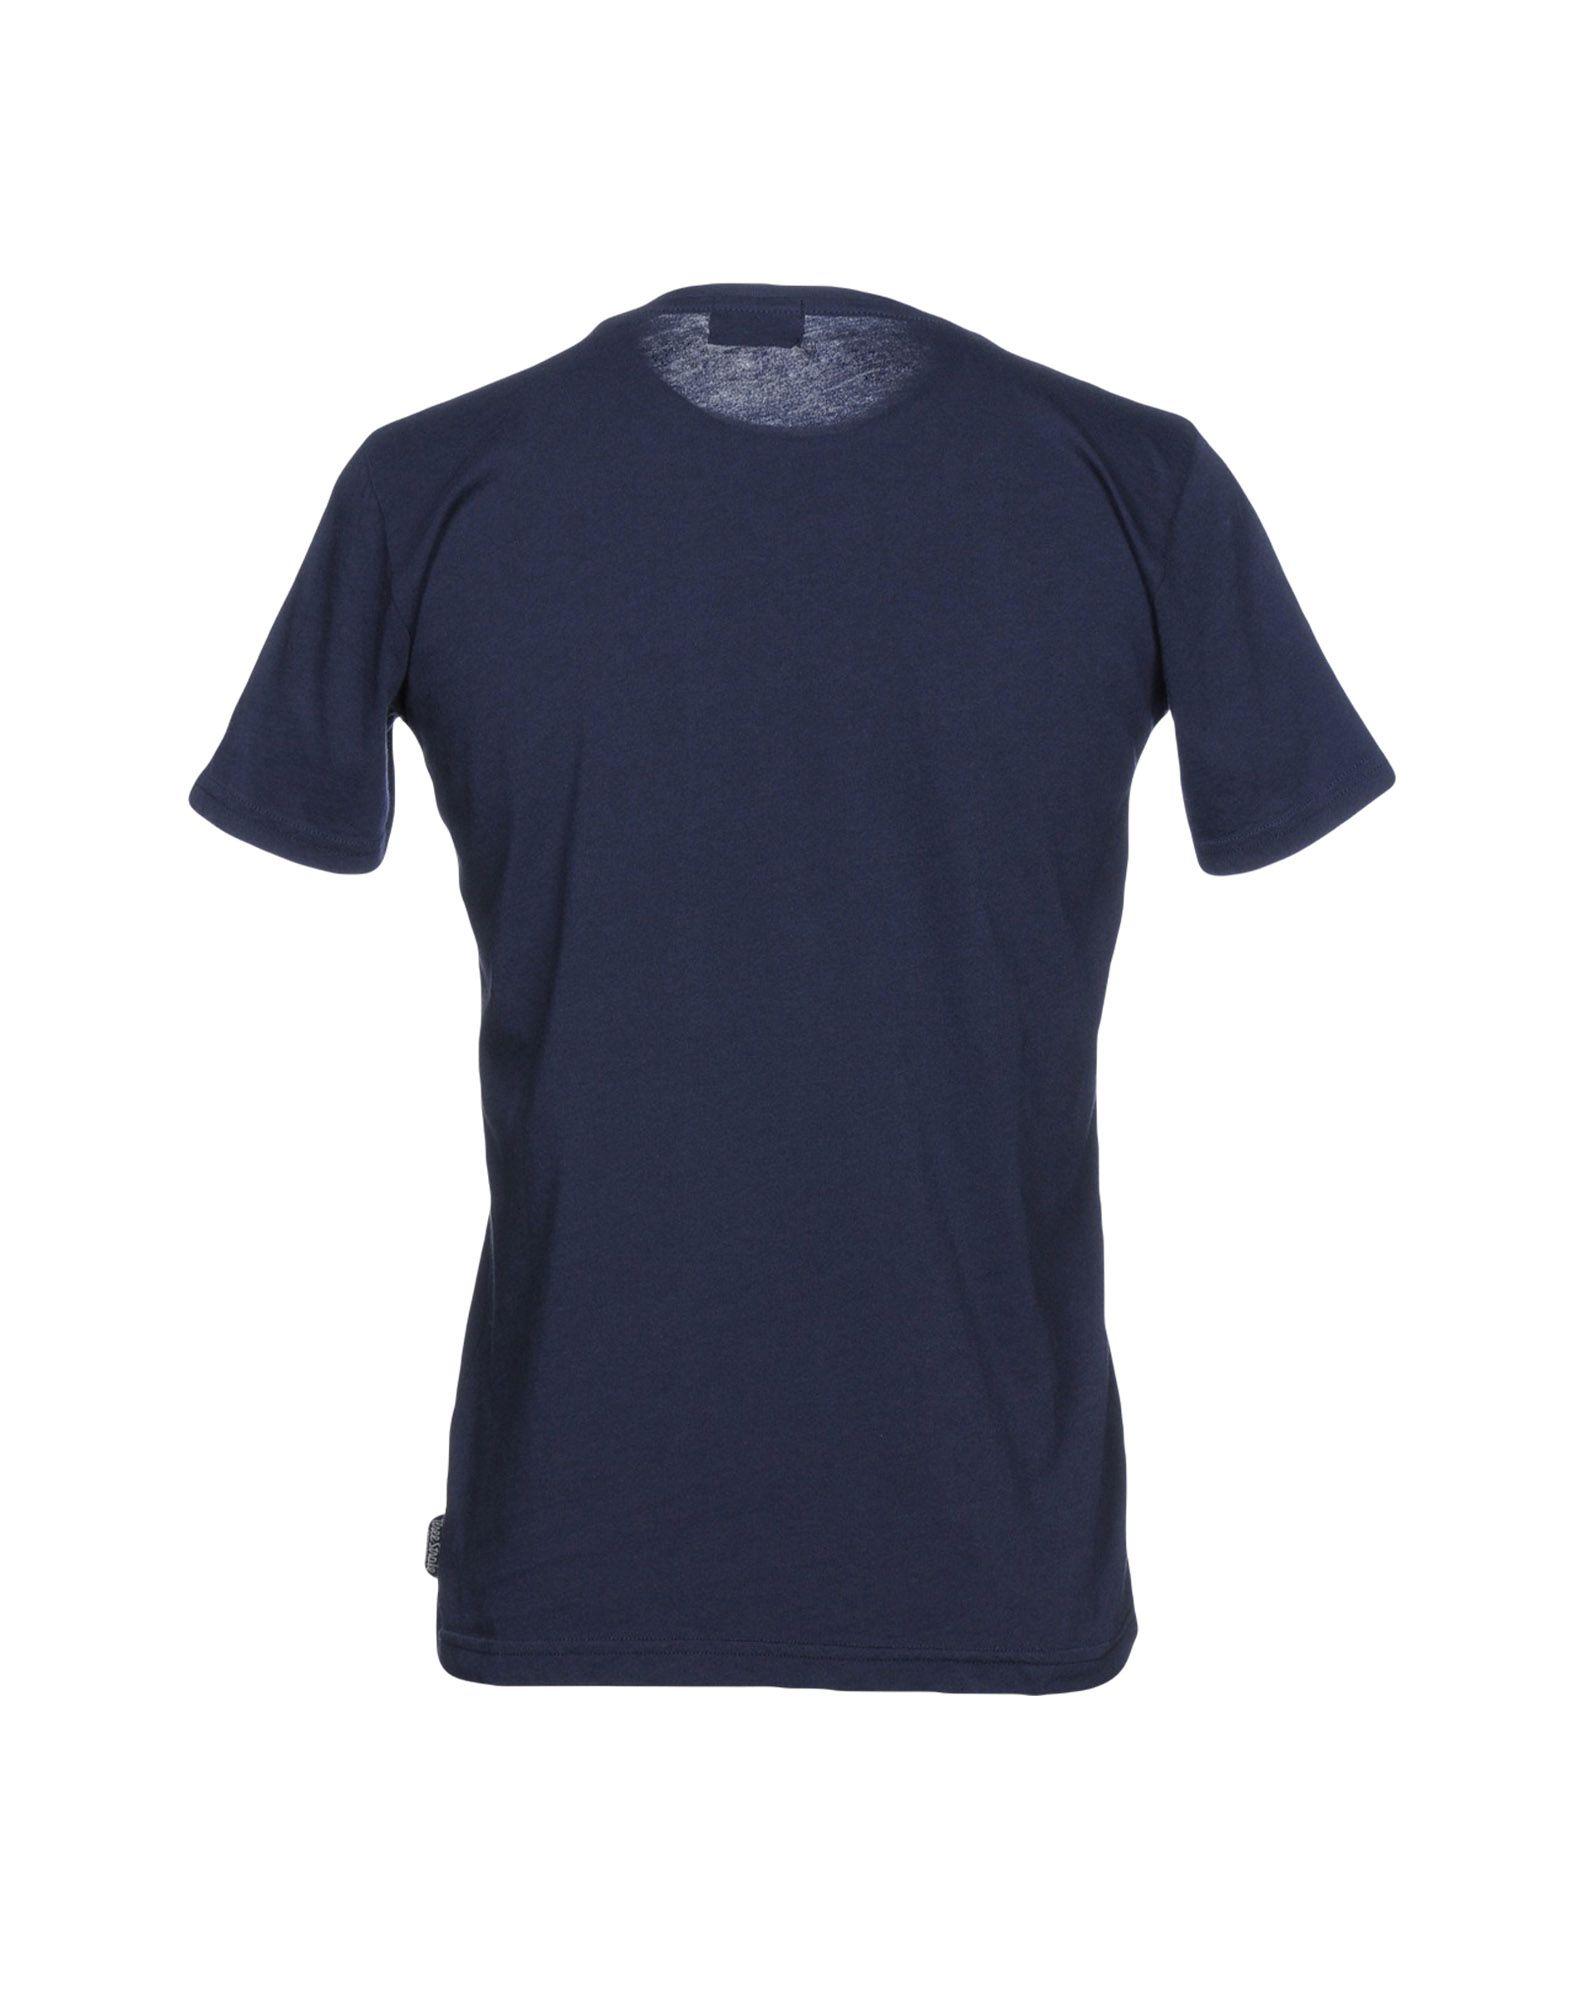 T-Shirt 12031416VN Three Stroke Uomo - 12031416VN T-Shirt 9742a9